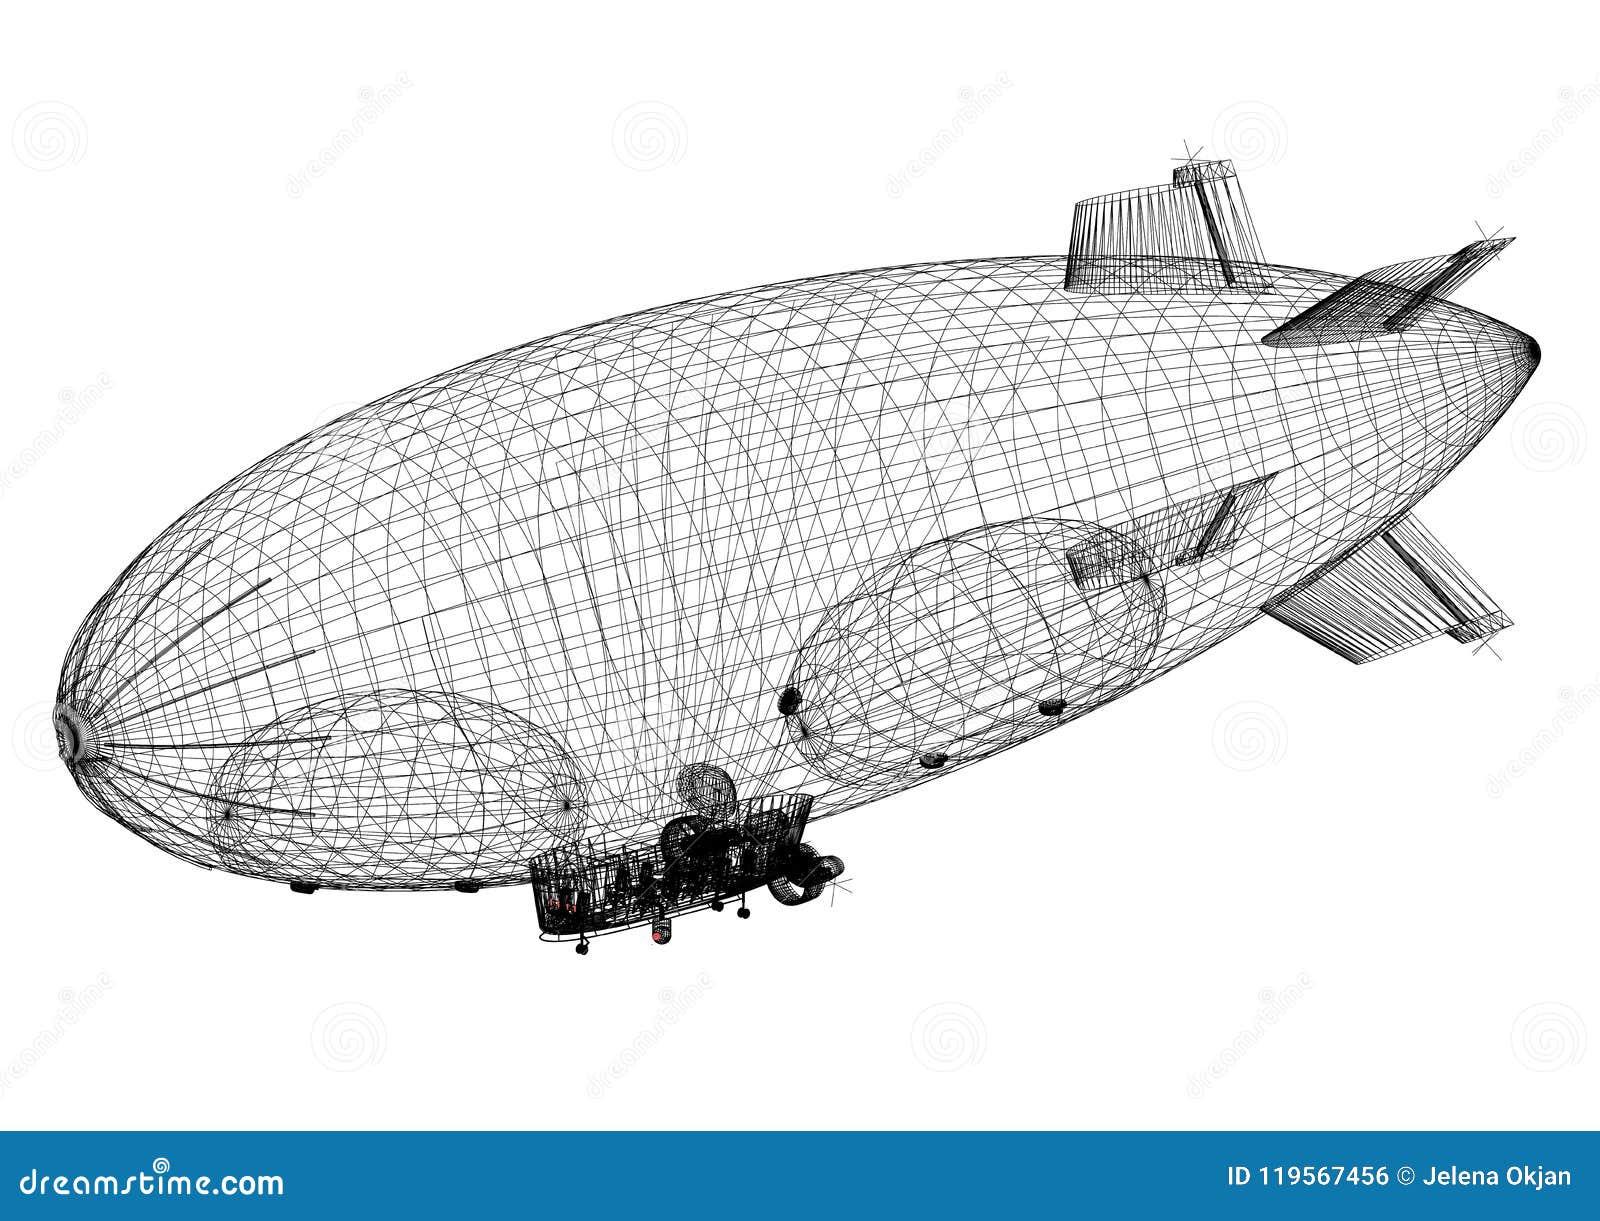 Airship design architect blueprint isolated stock illustration download airship design architect blueprint isolated stock illustration illustration of construction plane malvernweather Choice Image